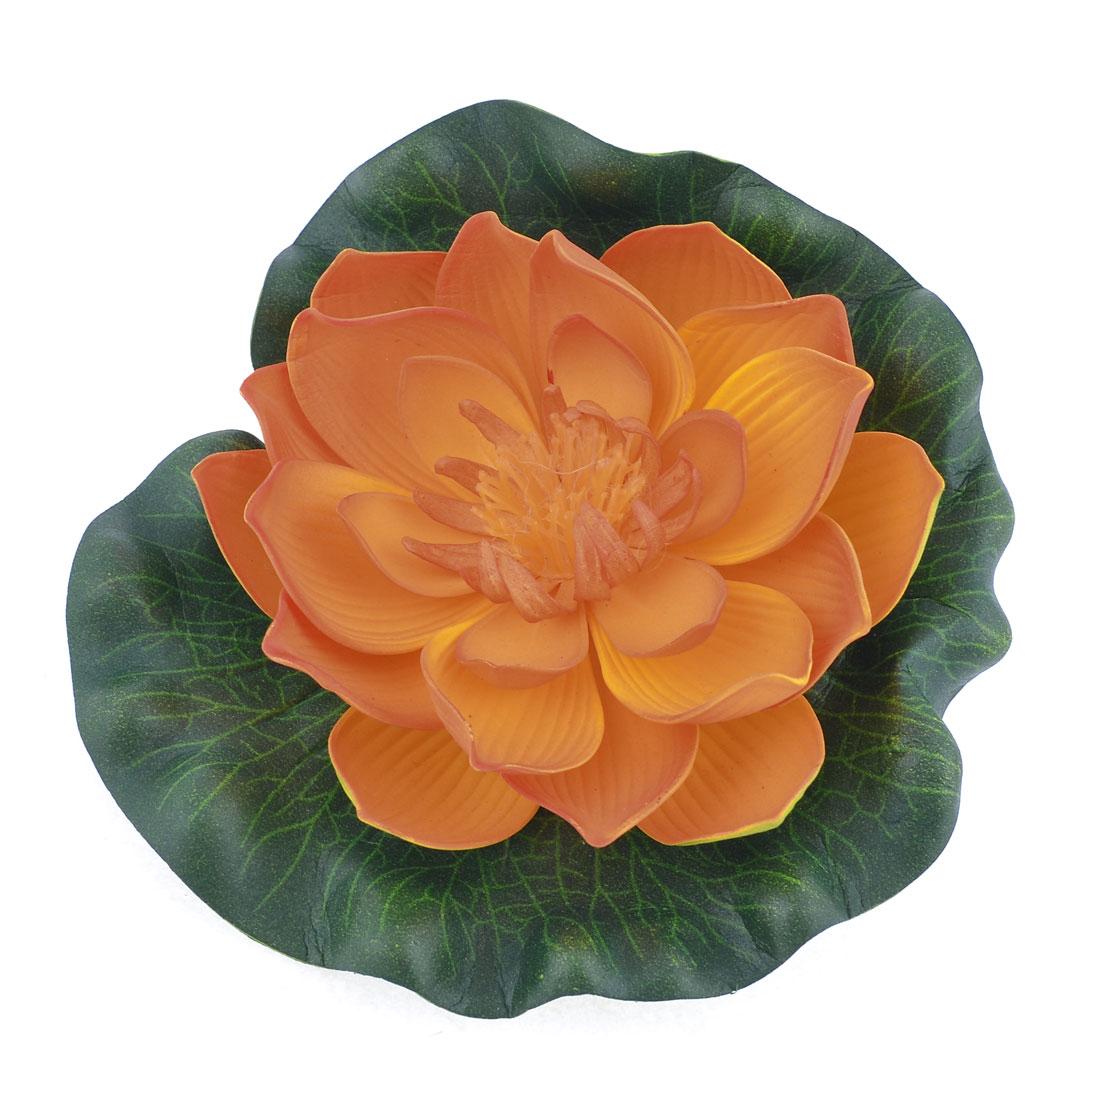 Aquarium Landscaping Green Leaf Yellow Foam Lotus Flower Decoration